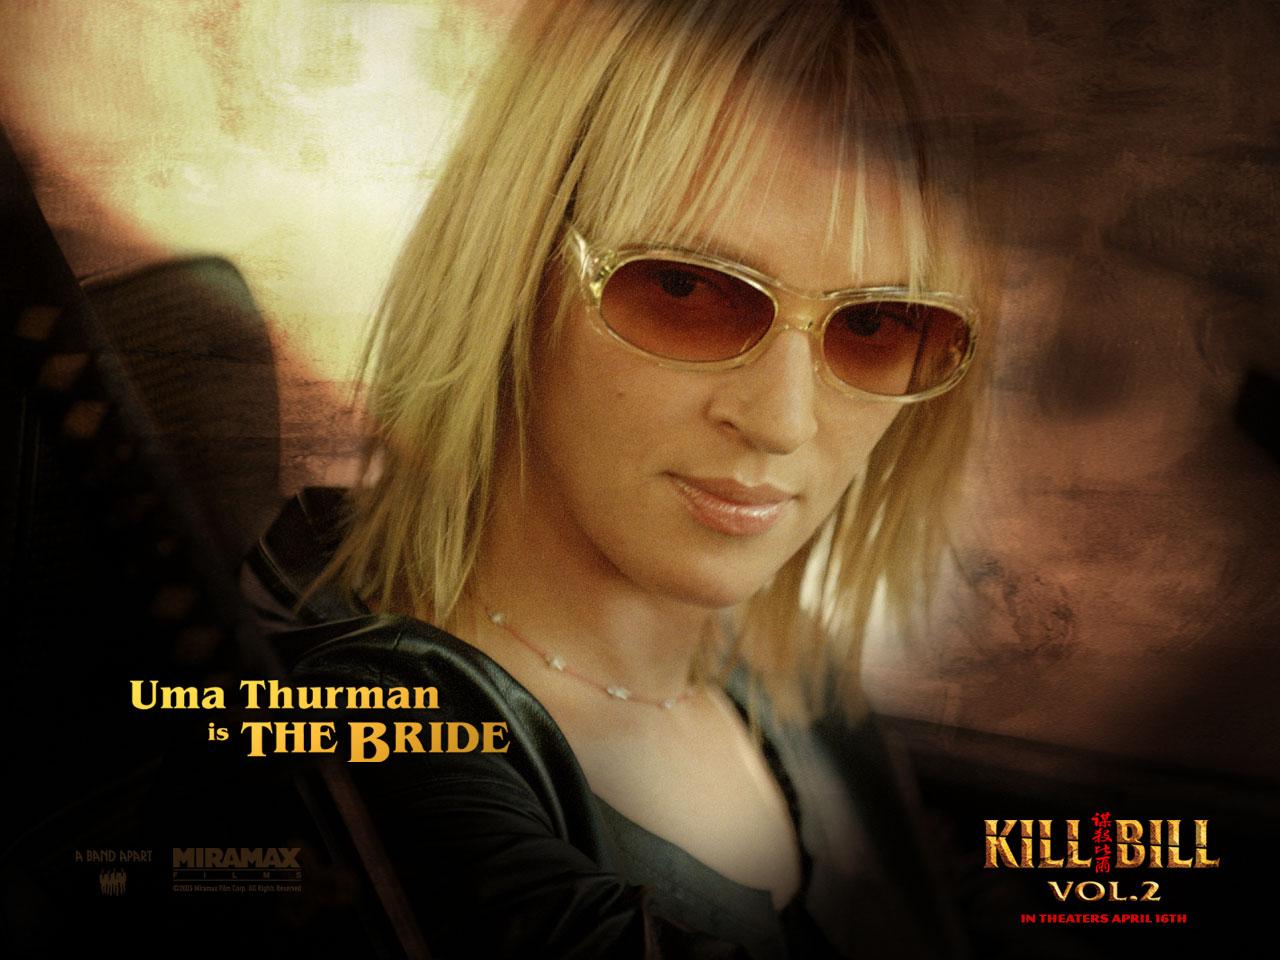 Tarantino Vai Dirigir Terceiro Filme Da Saga Kill Bill